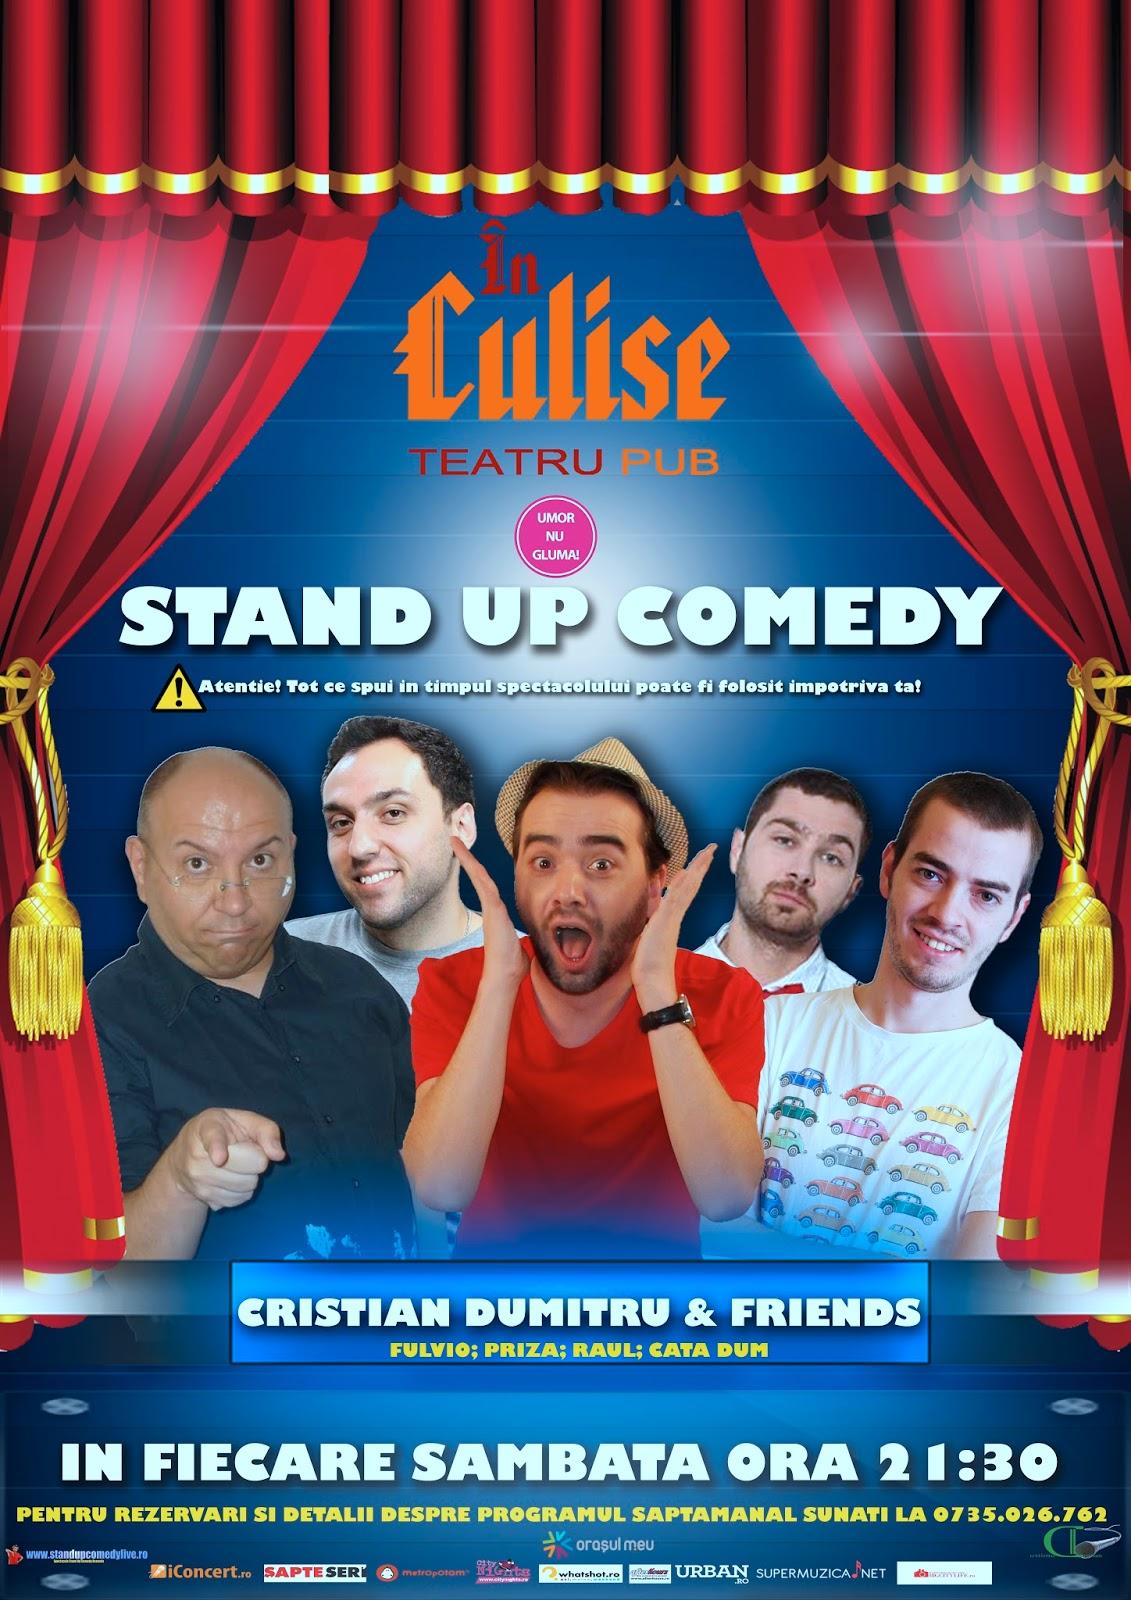 stand-up comedy Sambata @ Culise Comedy Club Bucuresti